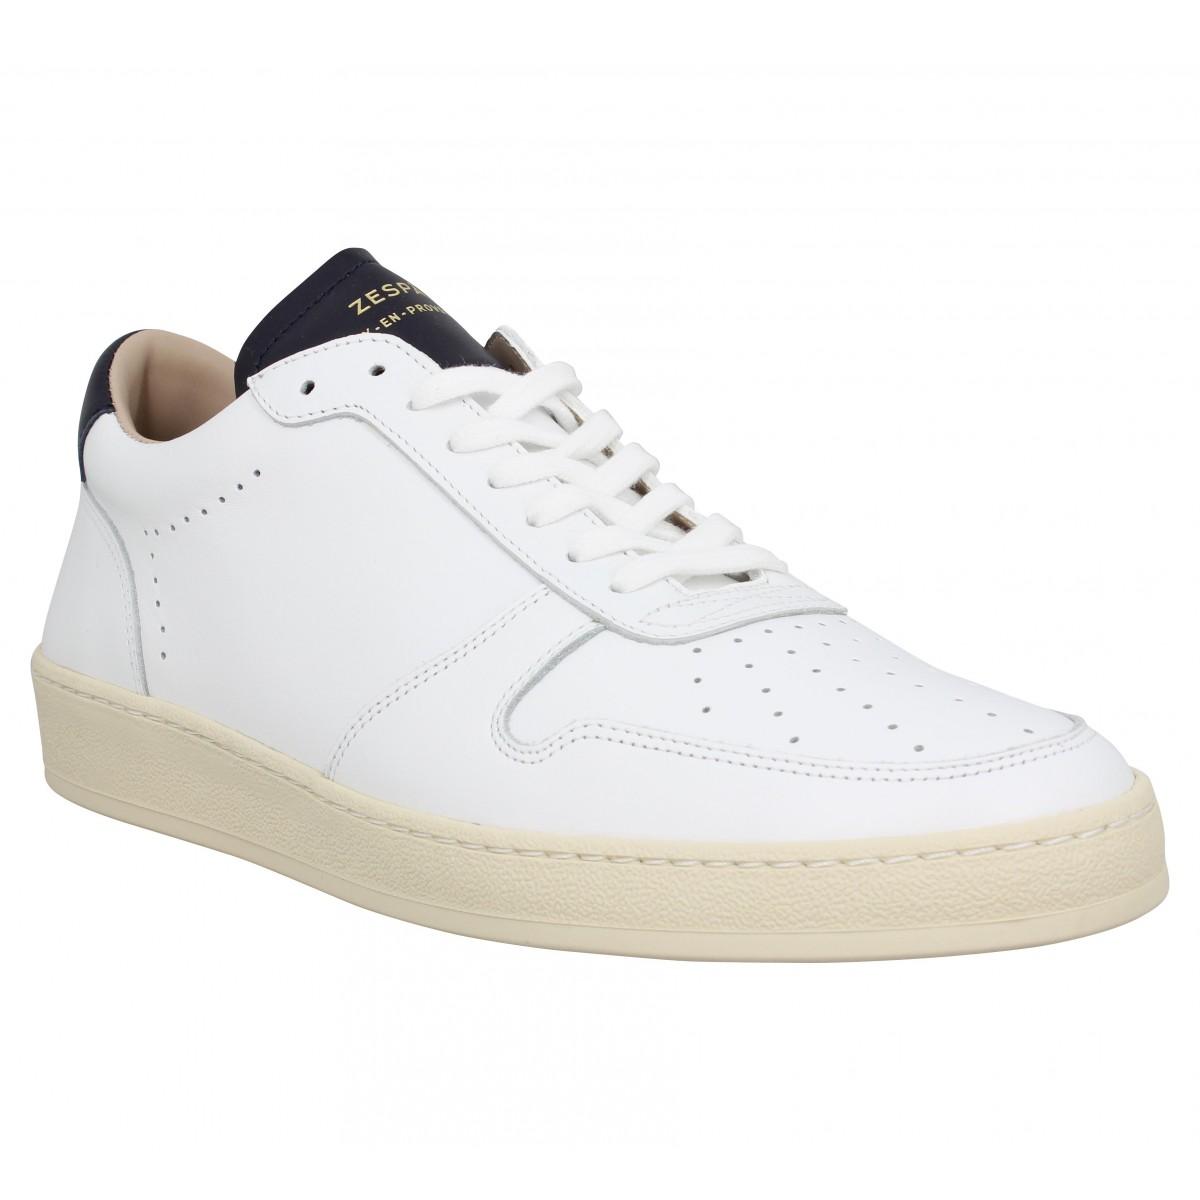 Baskets ZESPA ZSP23 cuir Homme Blanc Navy